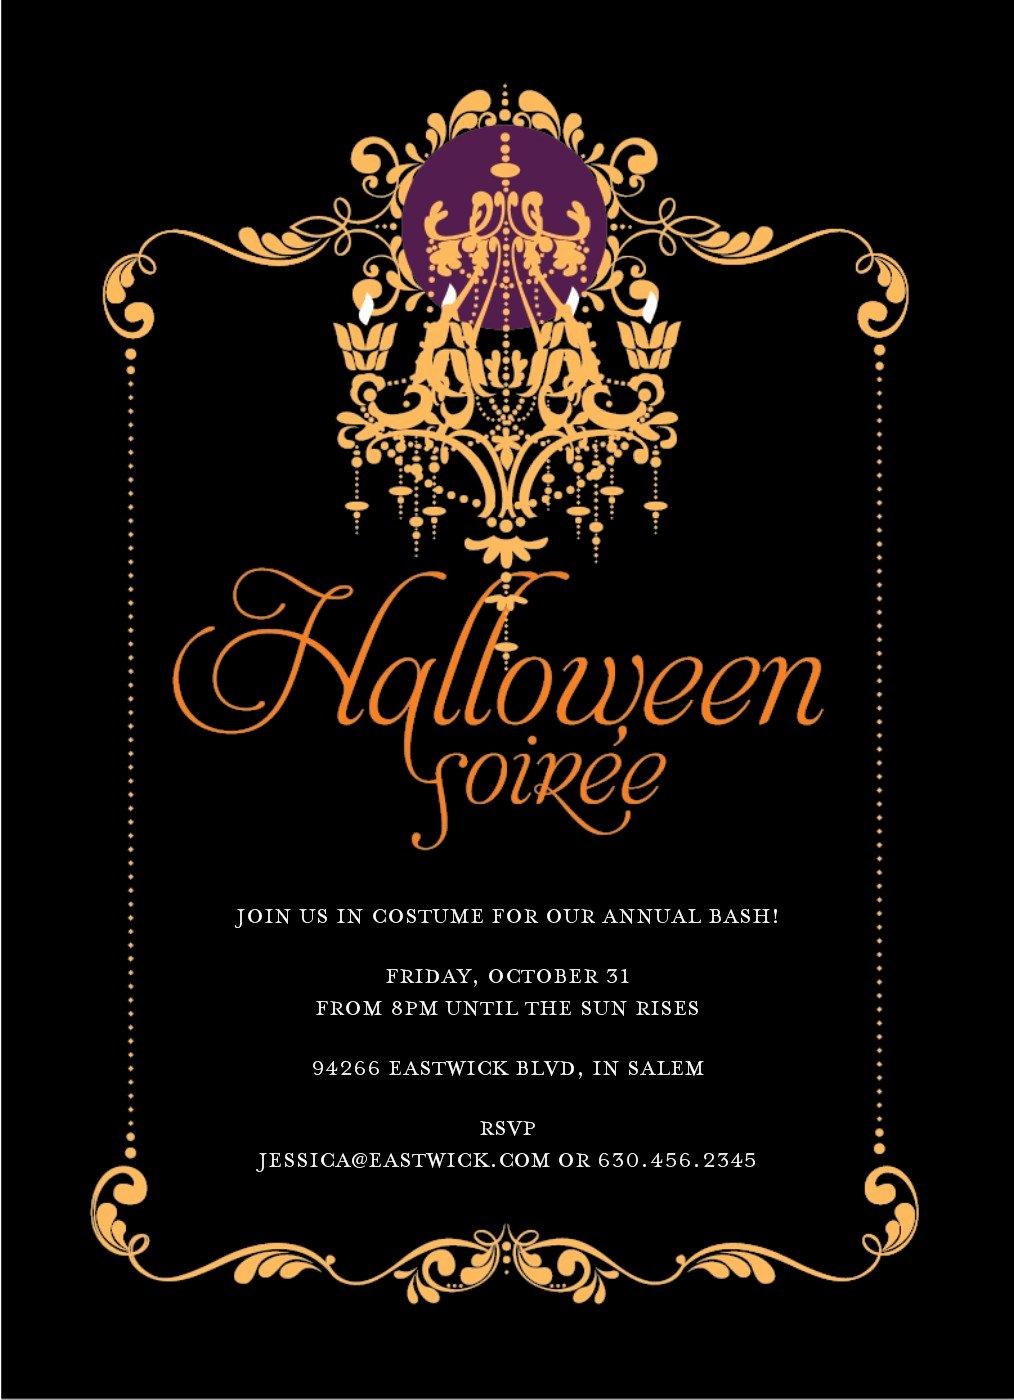 Spooky Party Invitation